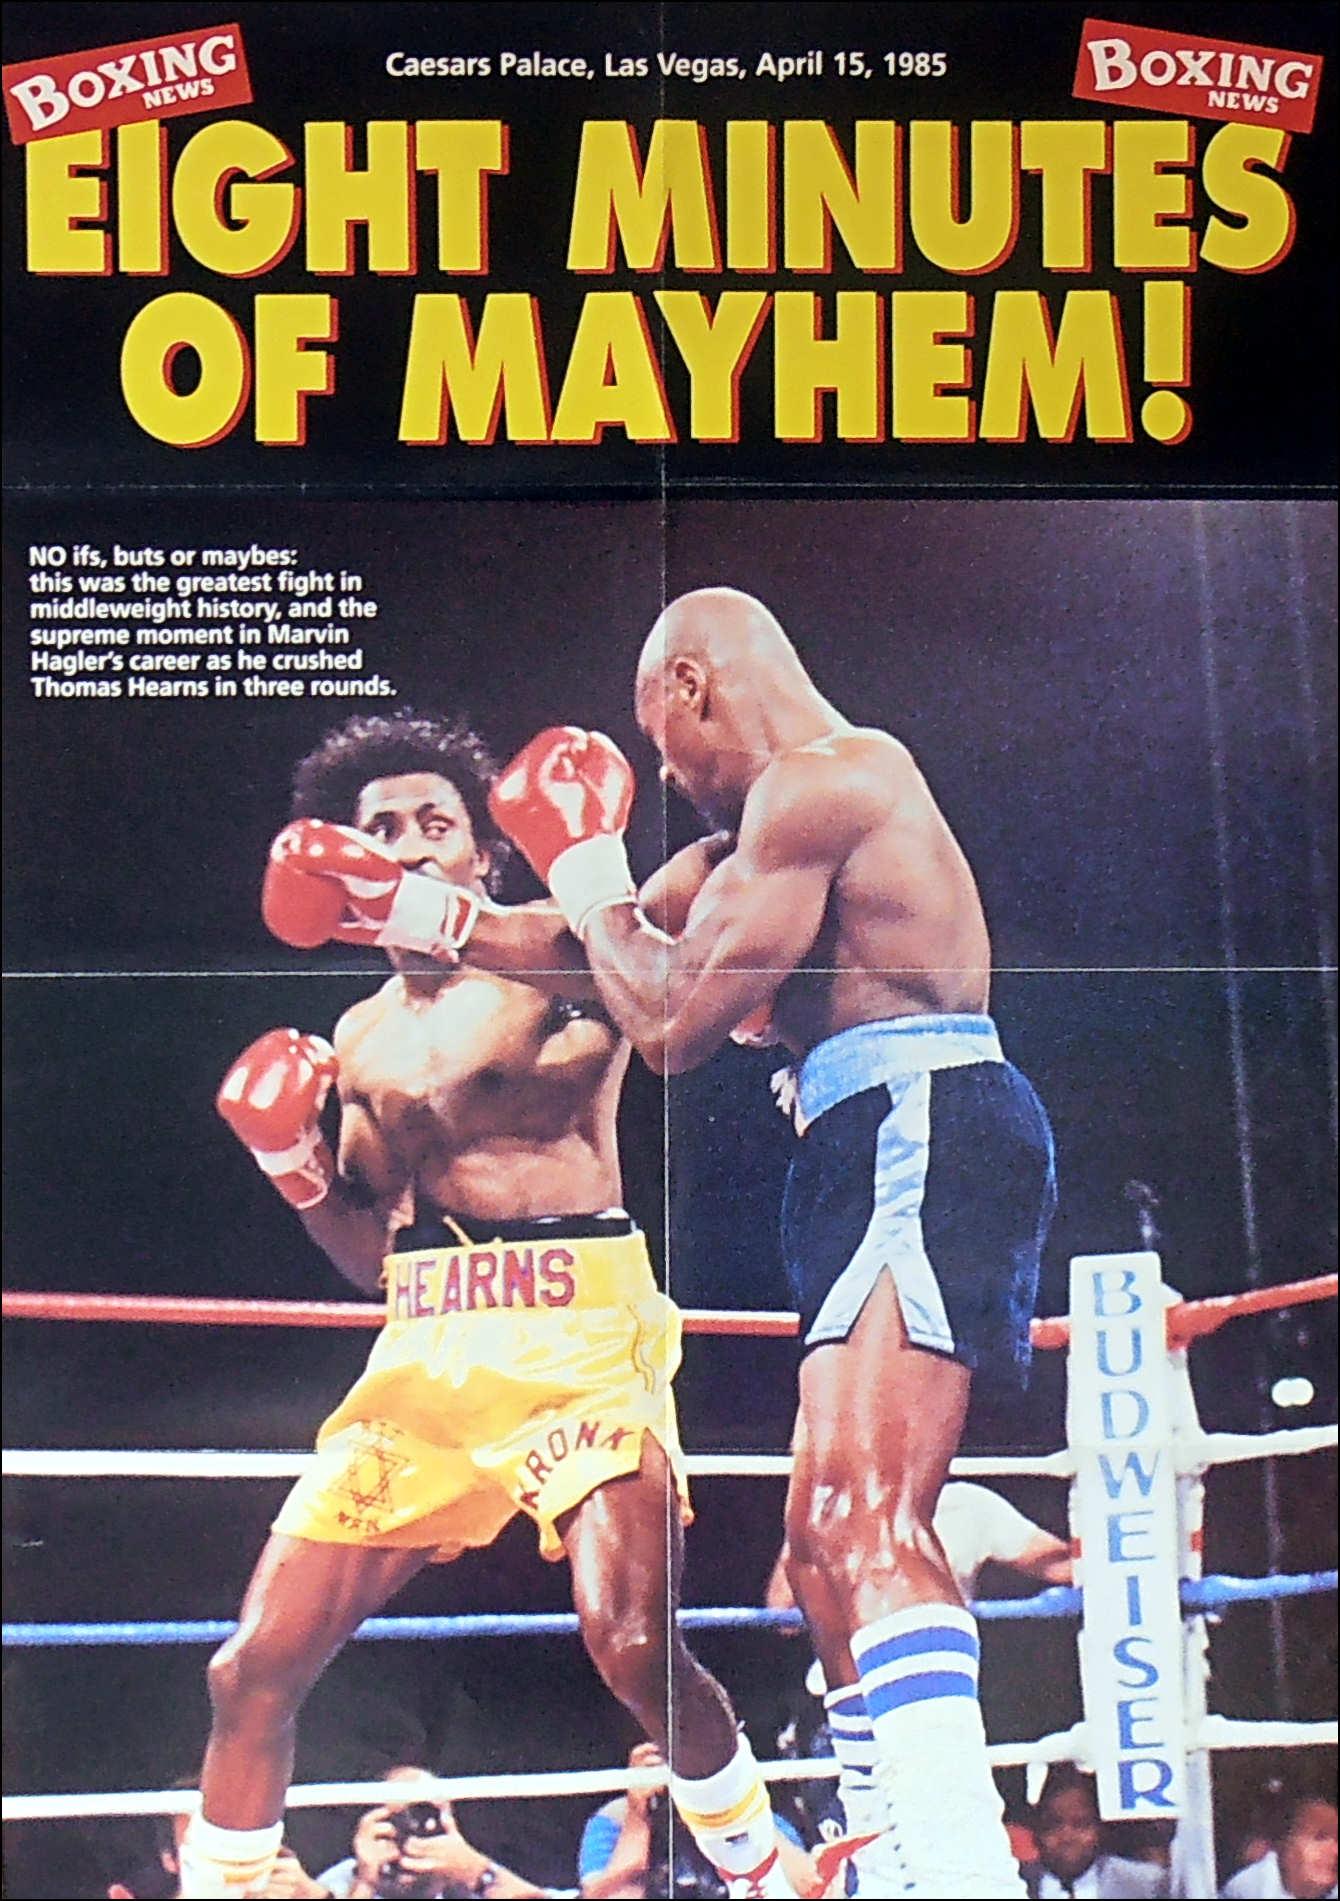 Marvin Hagler Vs Thomas Hearns Boxing News